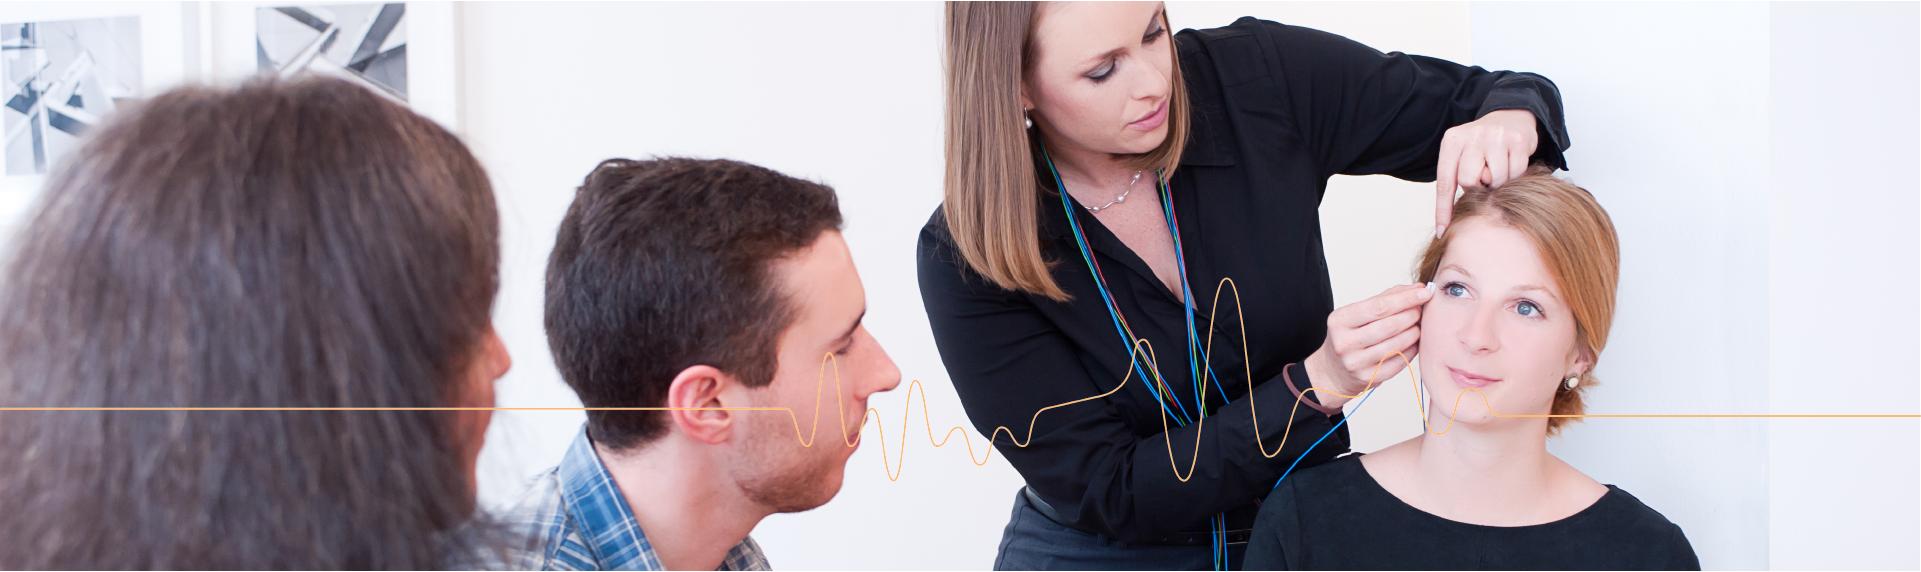 neurofeedback electrode demonstration